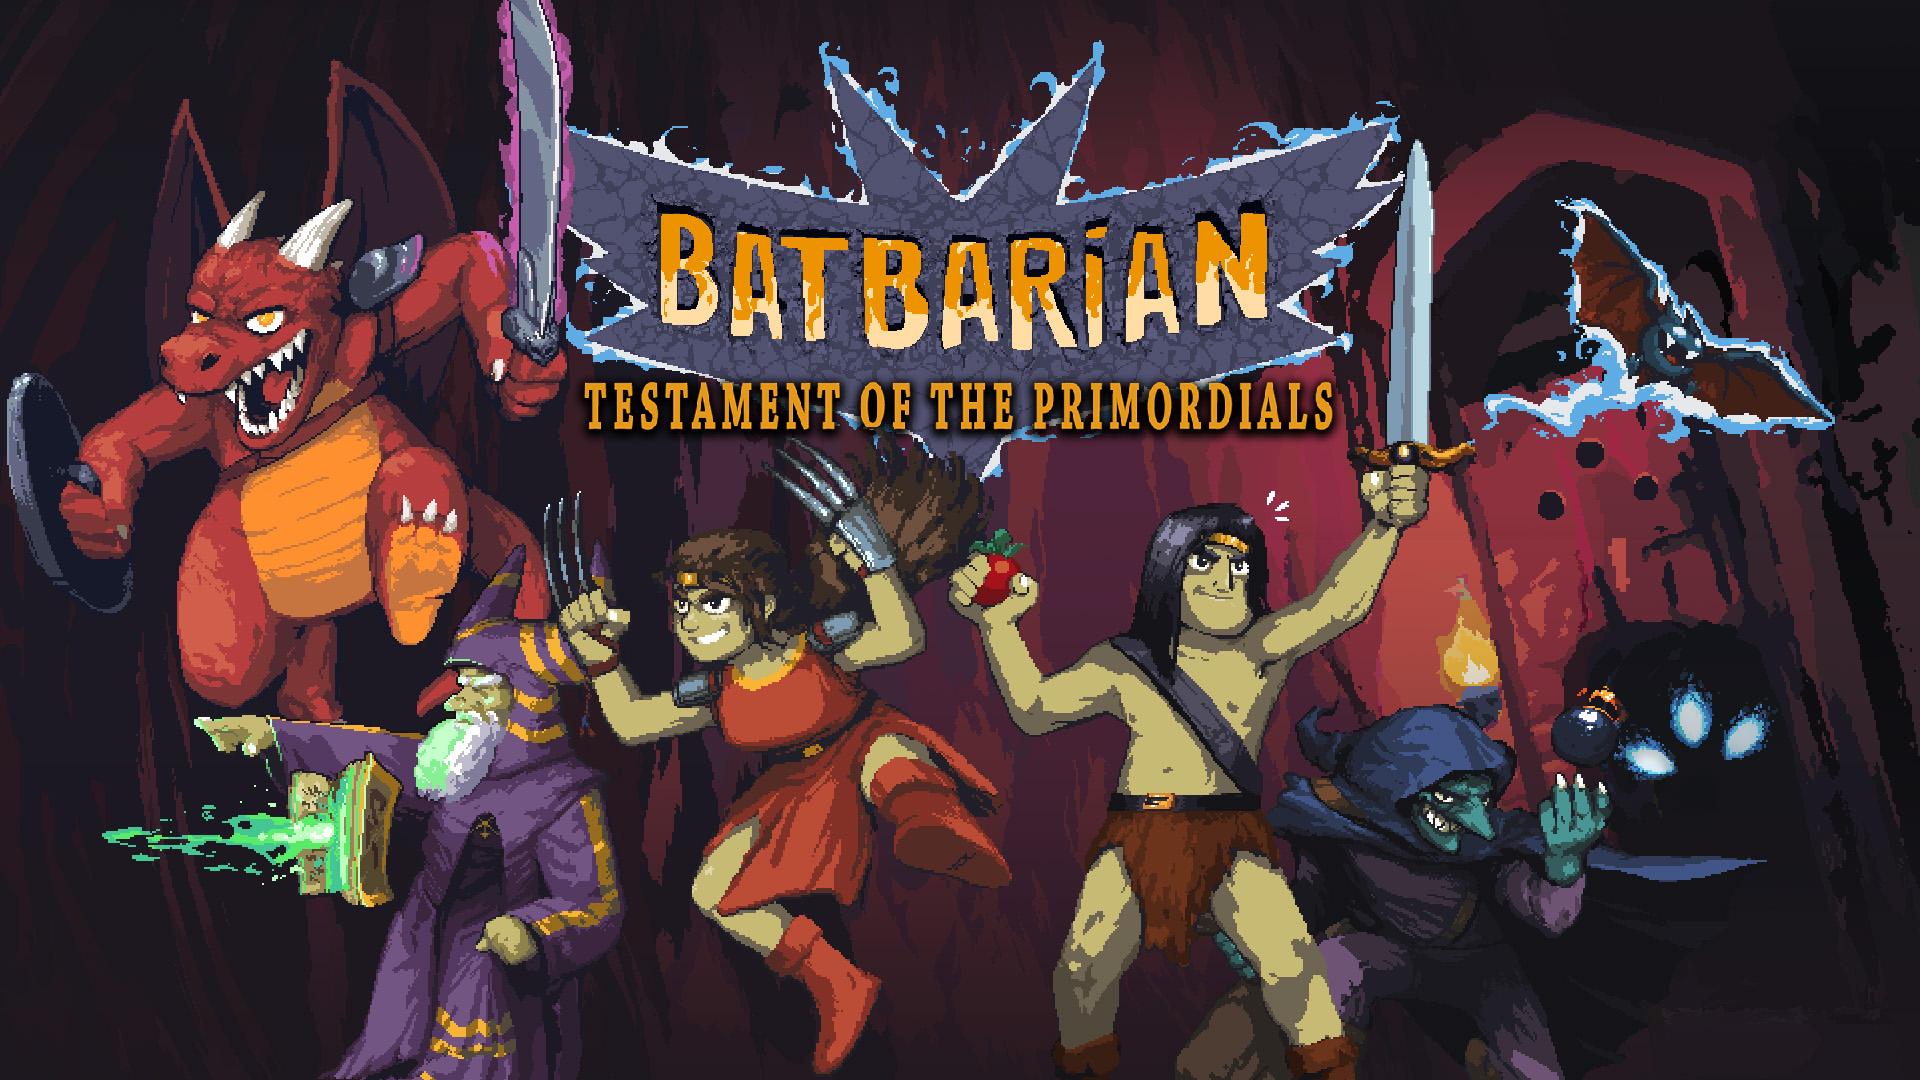 Batbarian: Testament of the Primordials + Original Soundtrack Bundle